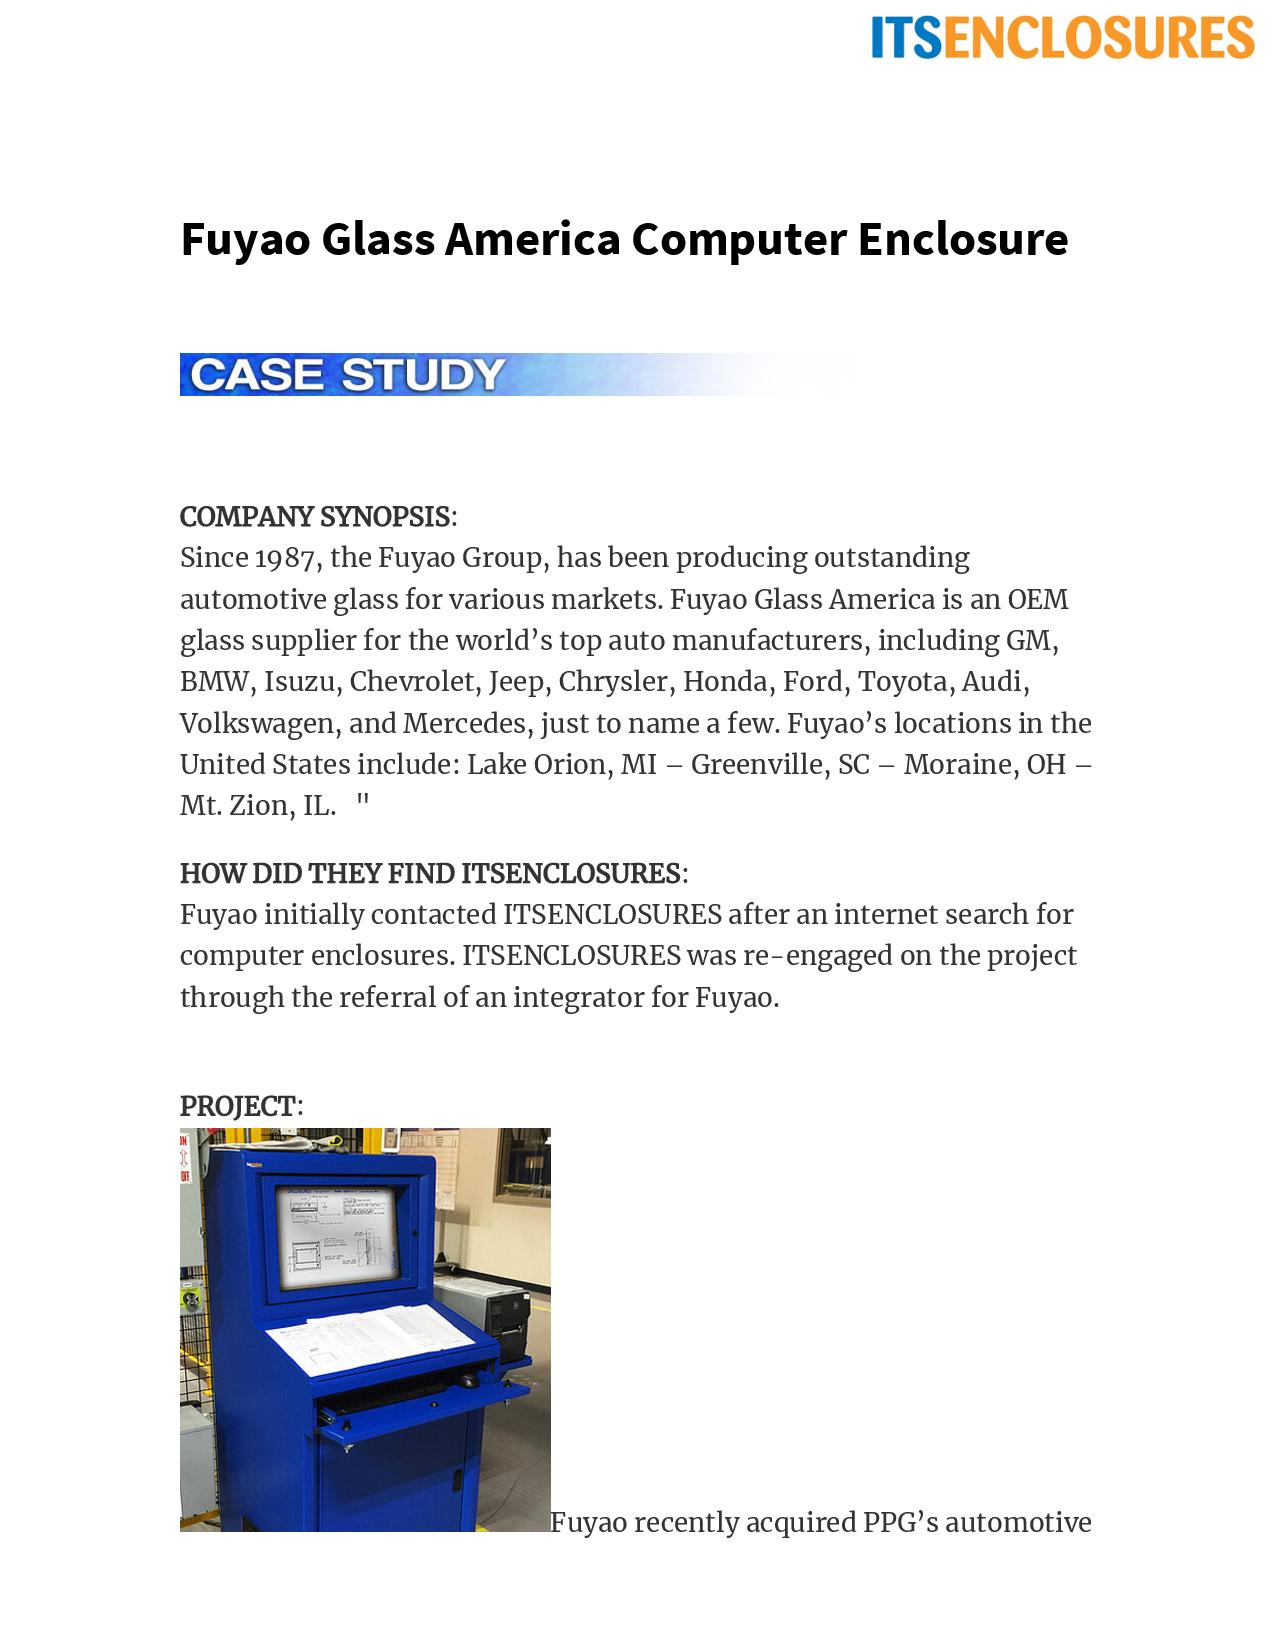 Fuyao Glass America Computer Enclosure